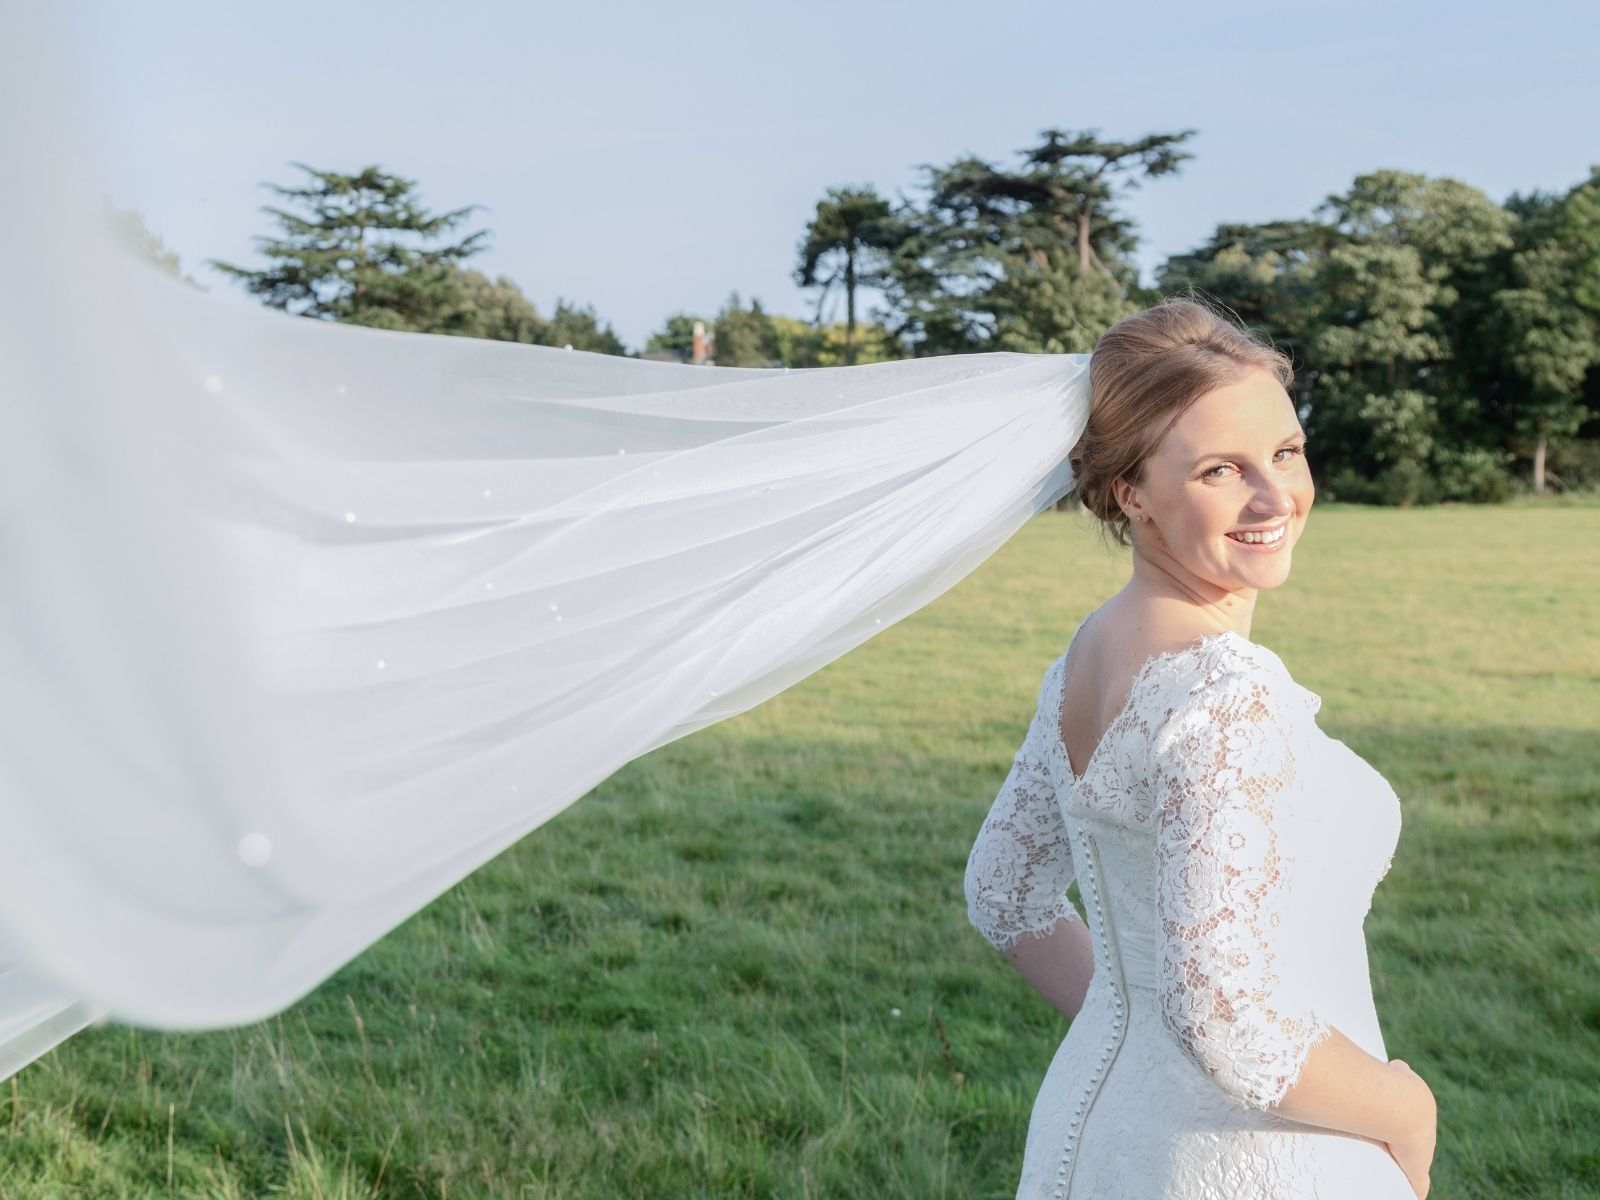 Rachel in her sleeved lace wedding dress